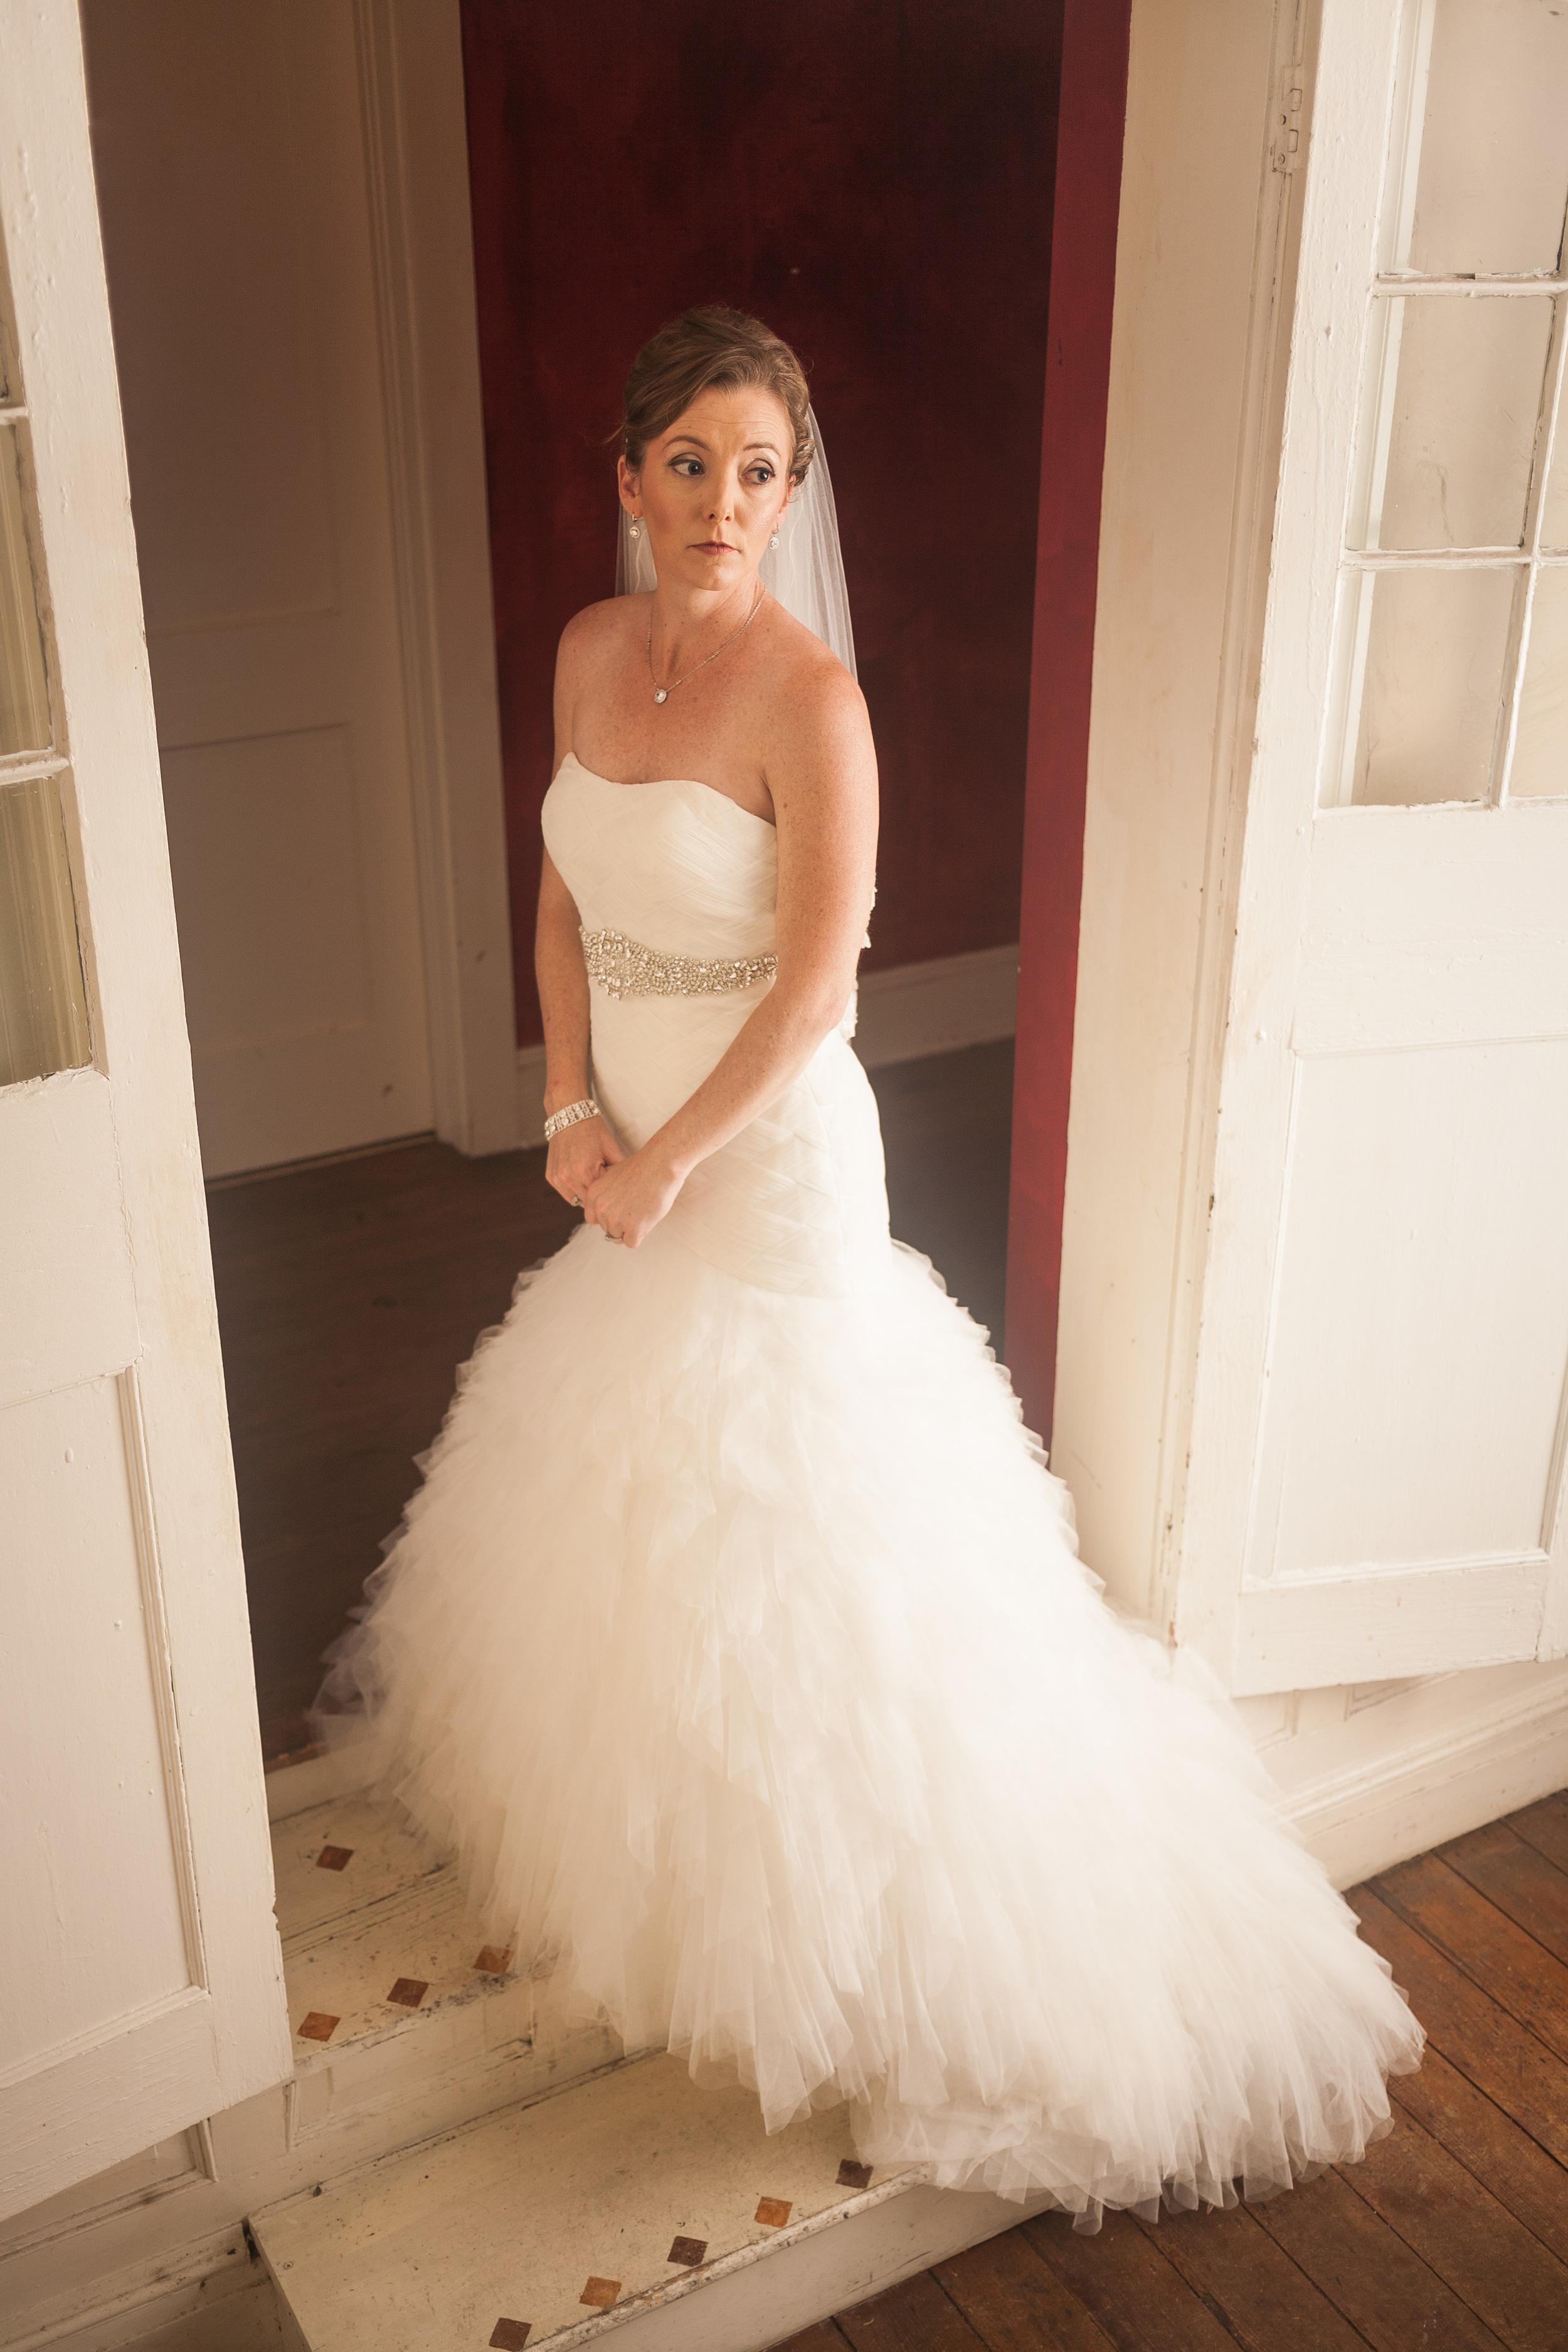 wedding photographer bent-lee carr the kyle house fincastle virginia bride in doorway looking off camera soft side light